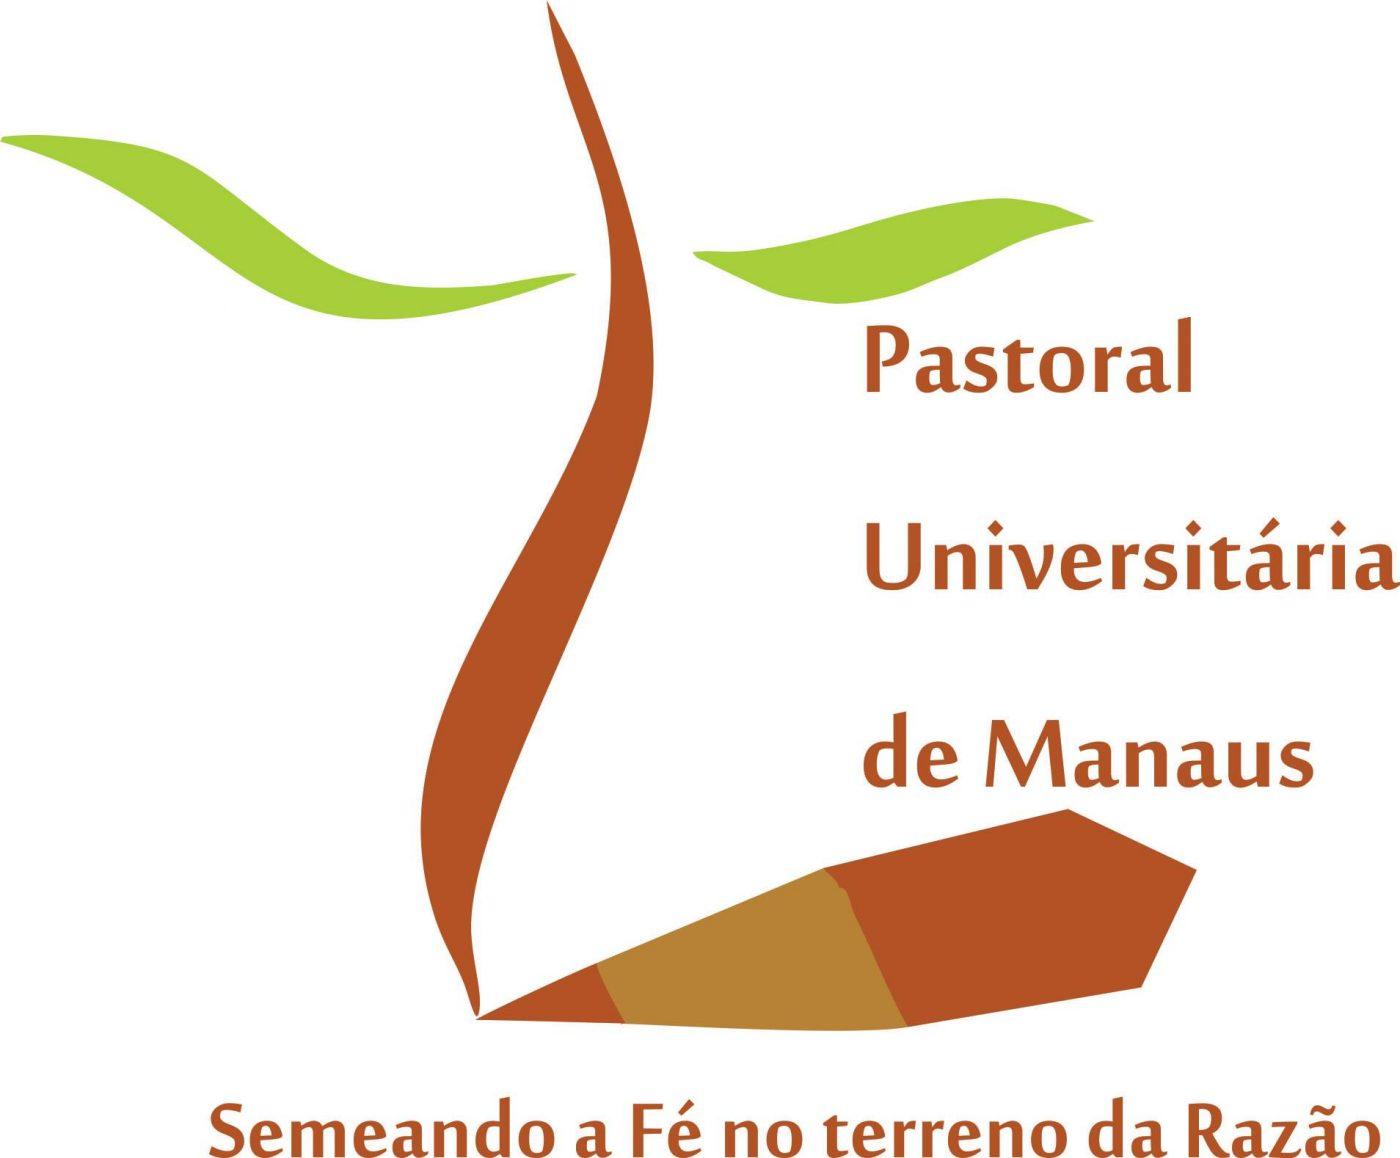 Pastoral Universitária